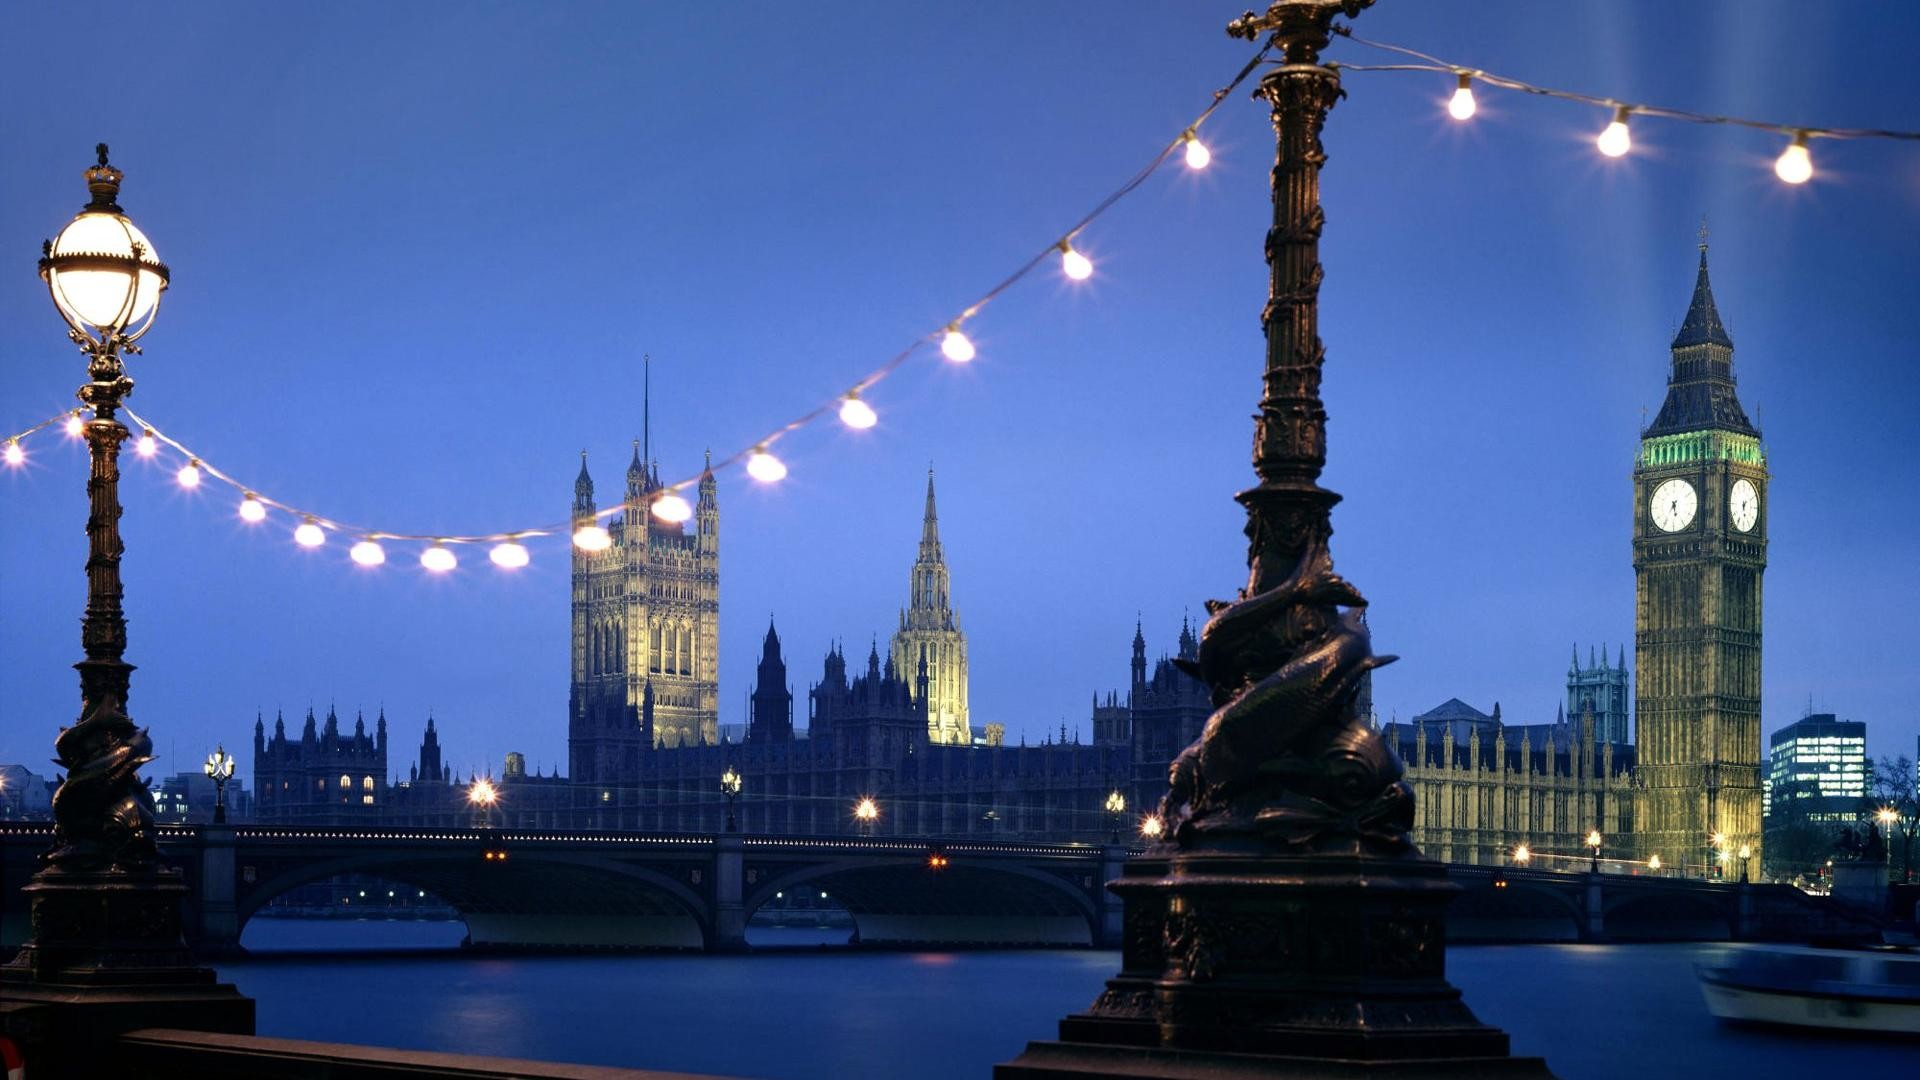 Luxuriant city scenery desktop backgrounds